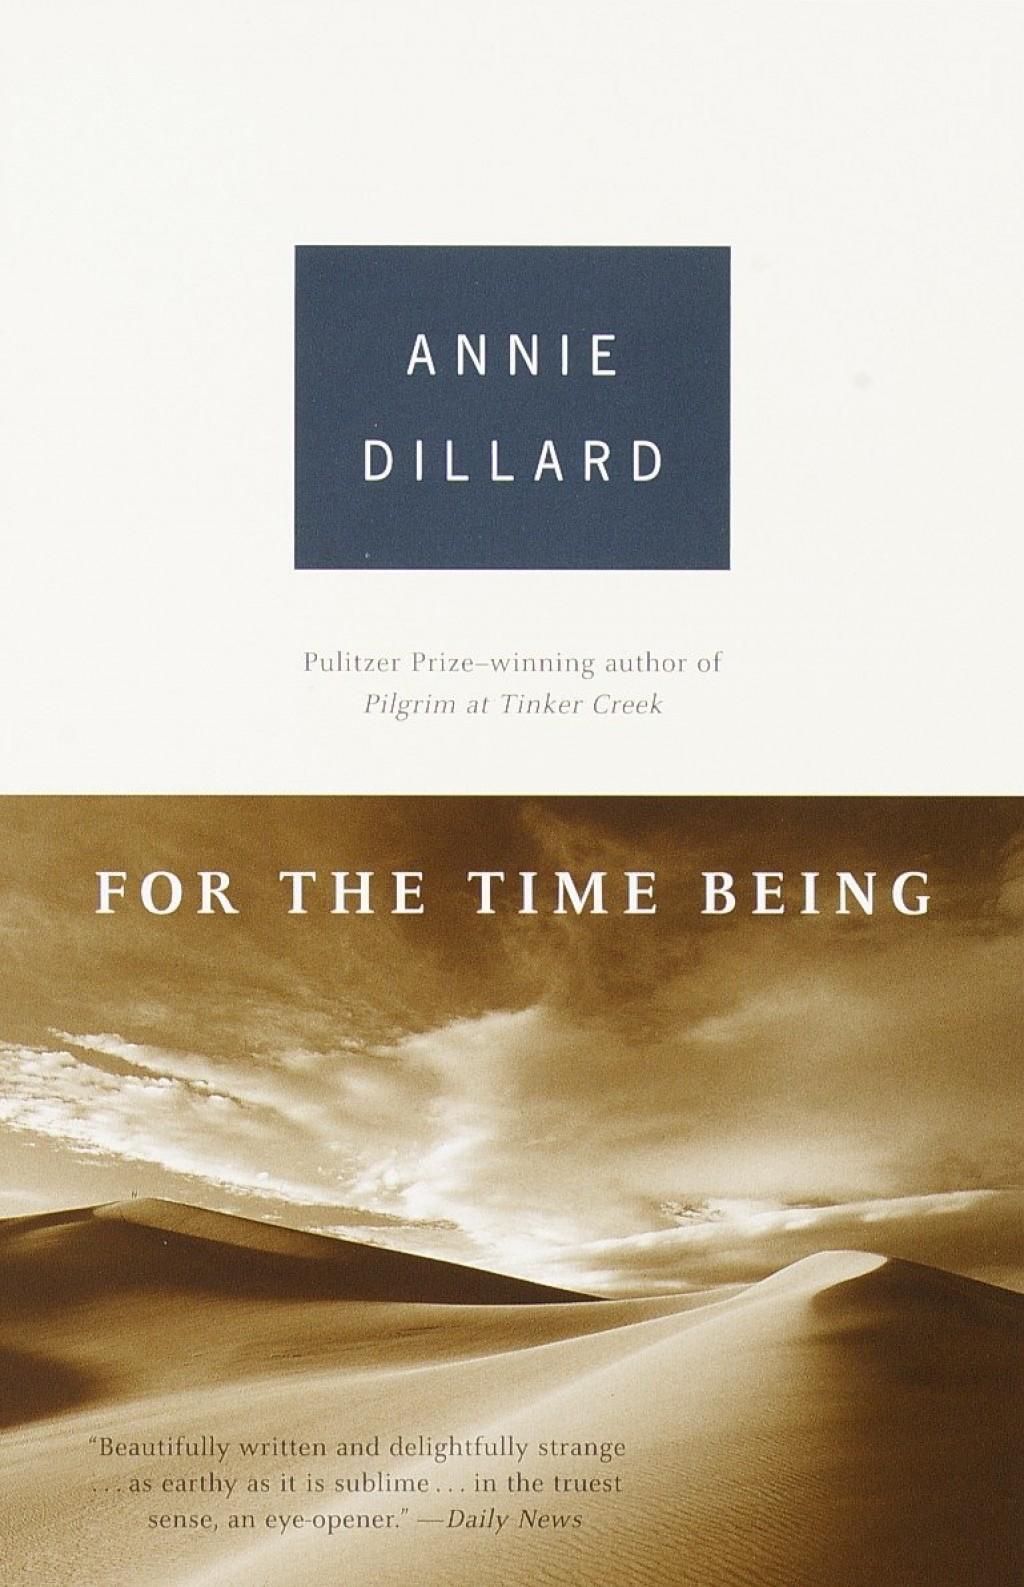 013 Annie Dillard Essays Essay Example Stirring Stunt Pilot Pdf An American Childhood Large